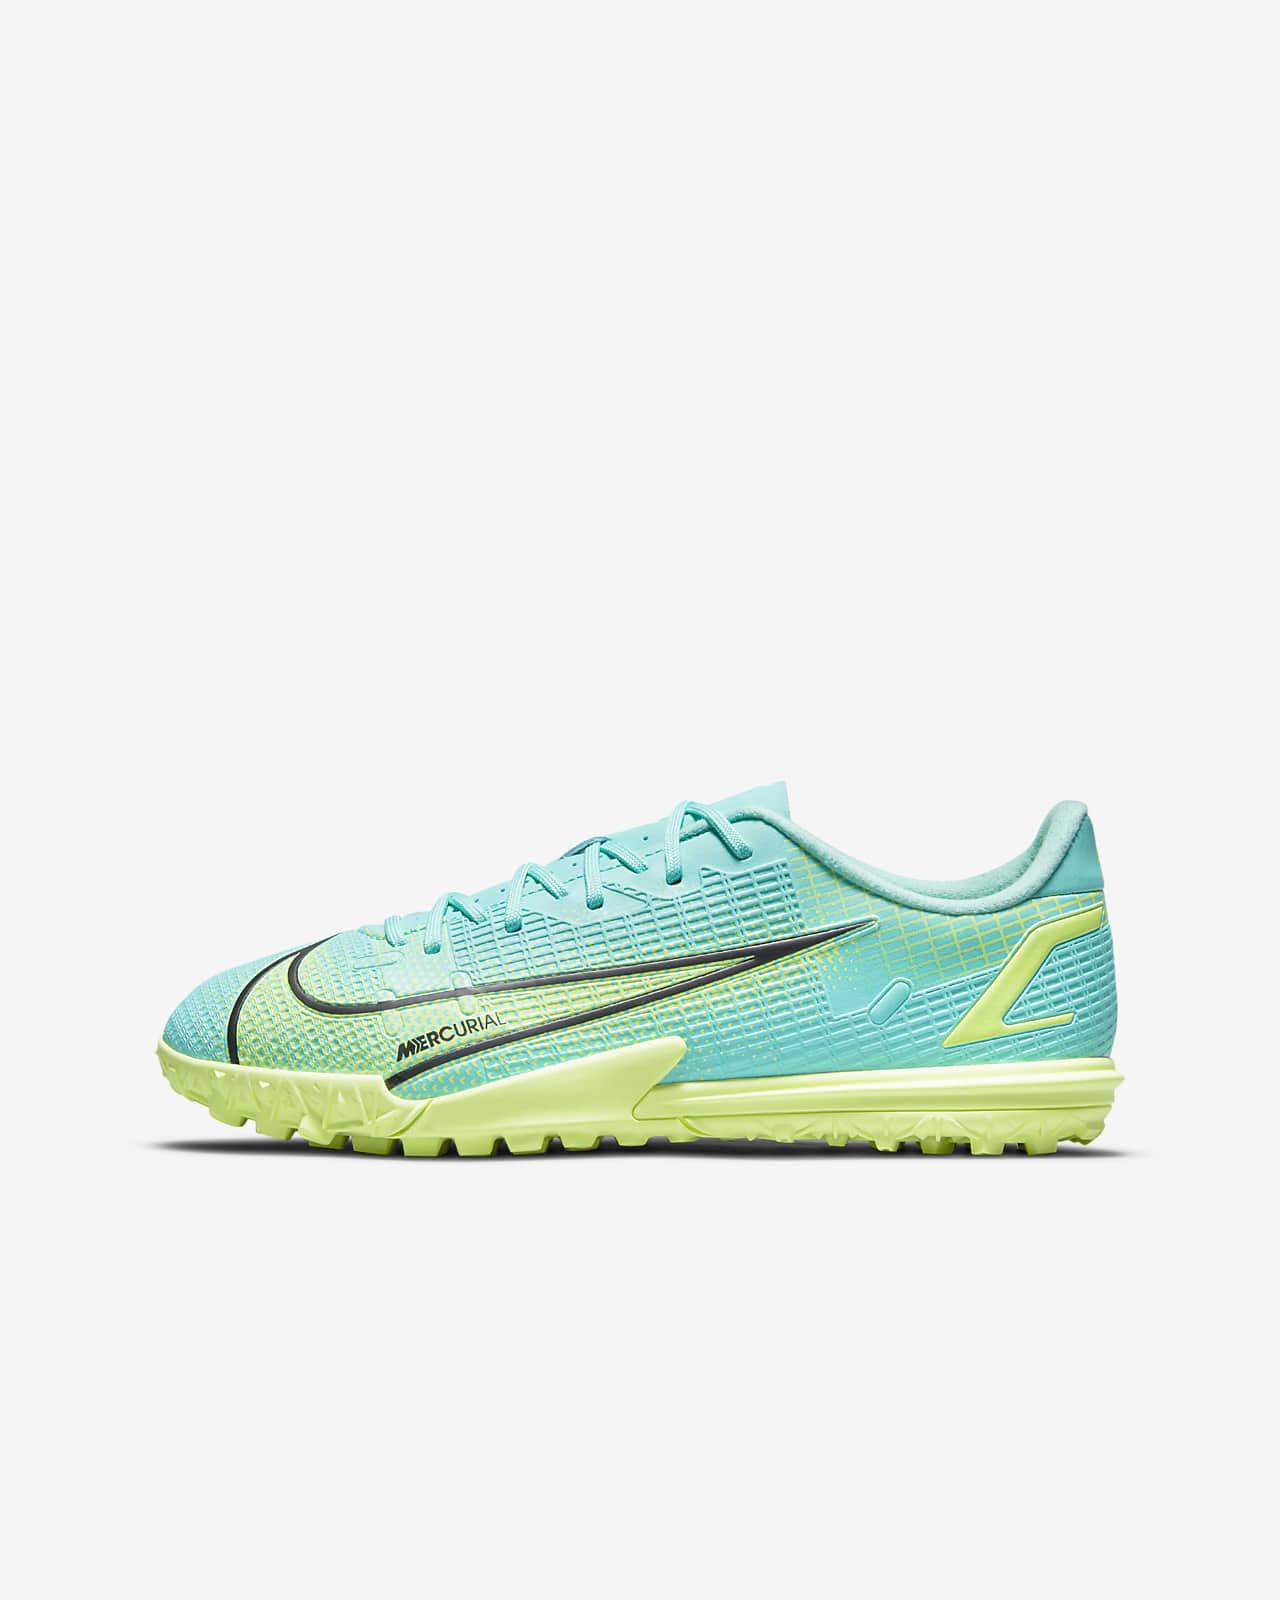 Scarpa da calcio per erba sintetica Nike Jr. Mercurial Vapor 14 Academy TF - Bambini/Ragazzi